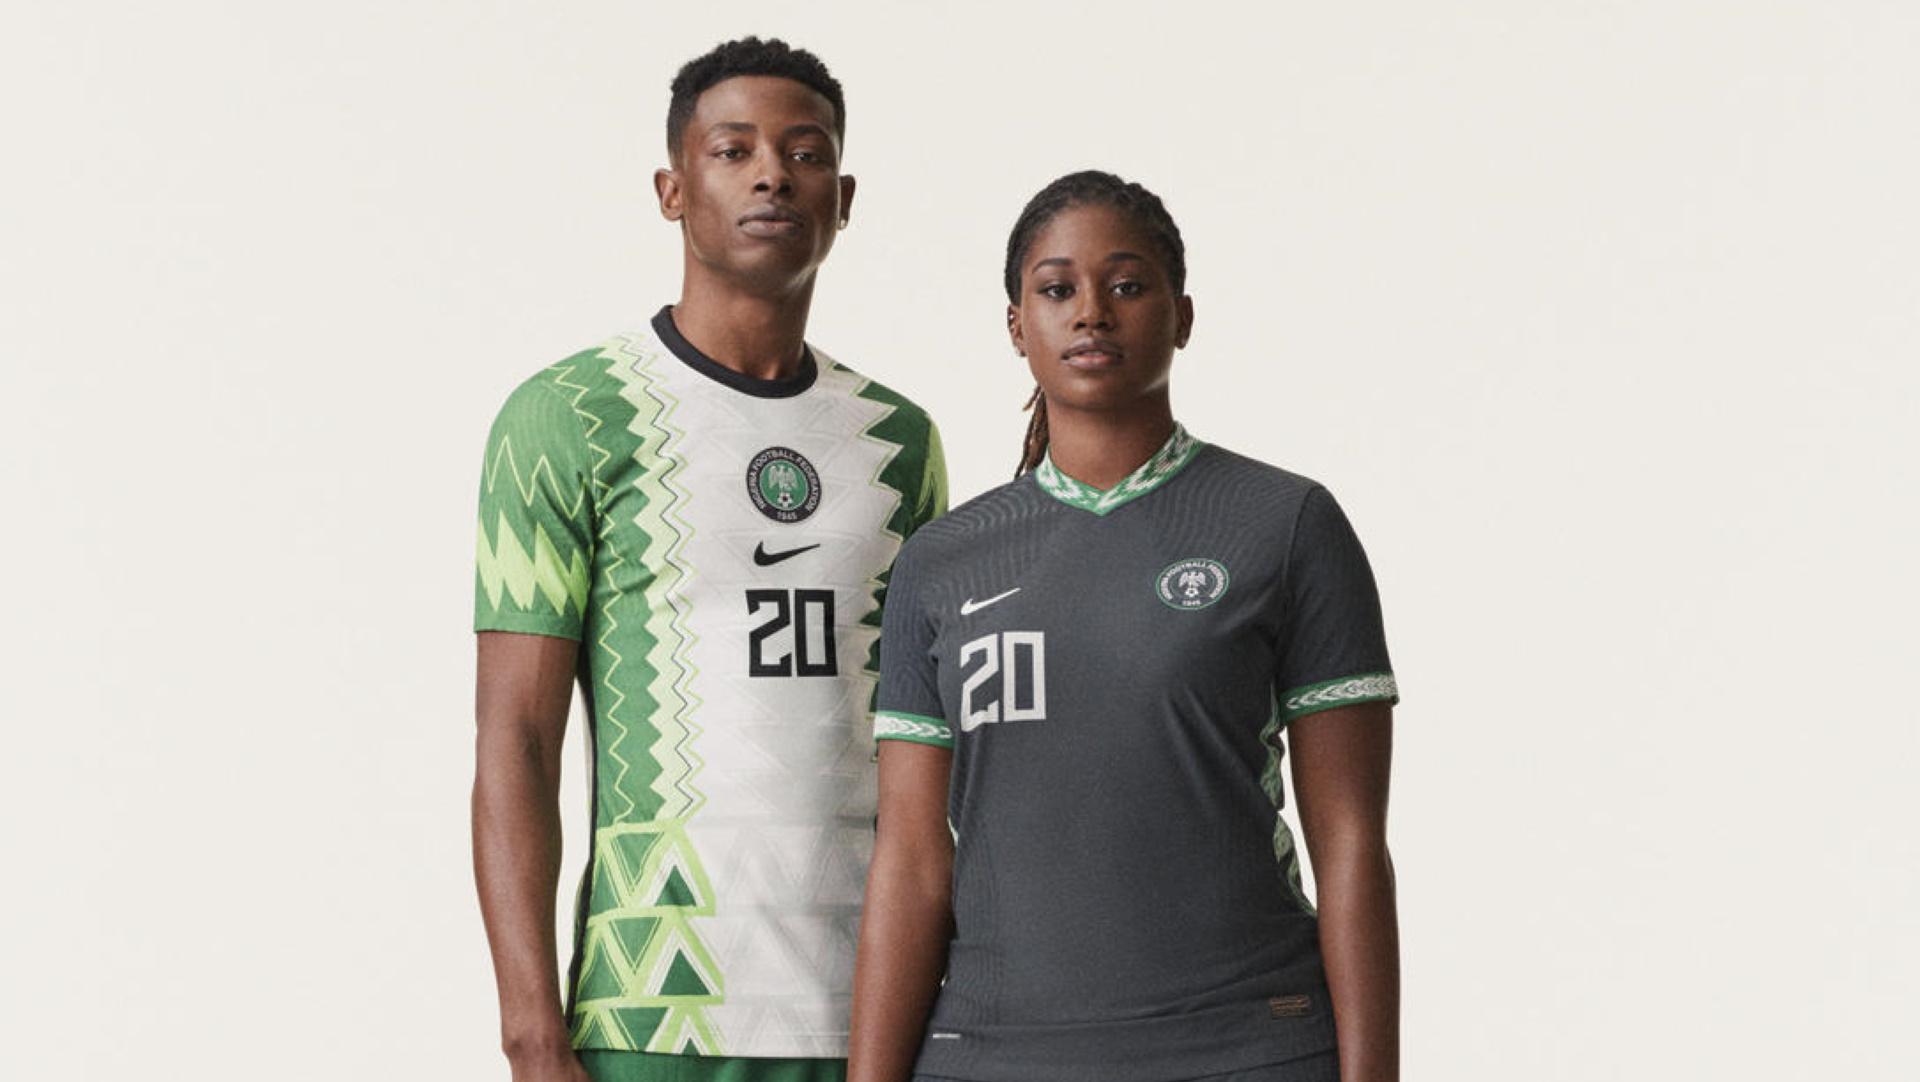 Pulido Sada Tacón  Nigeria kits: Nike unveil dazzling new 'Swoosh' design   Goal.com